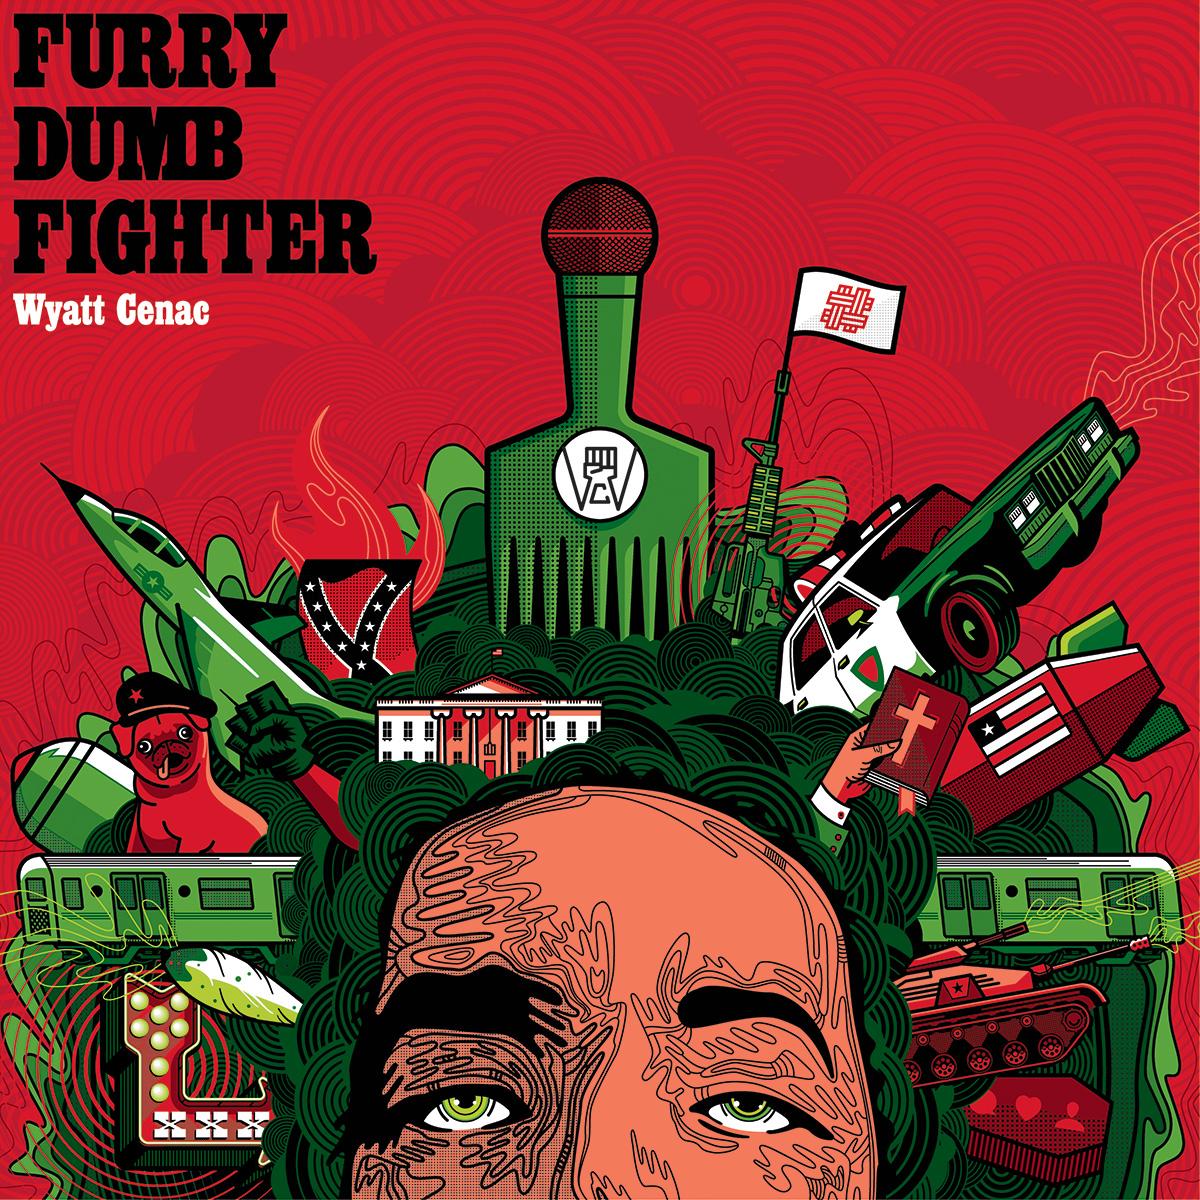 FurryDumbFighter.jpg